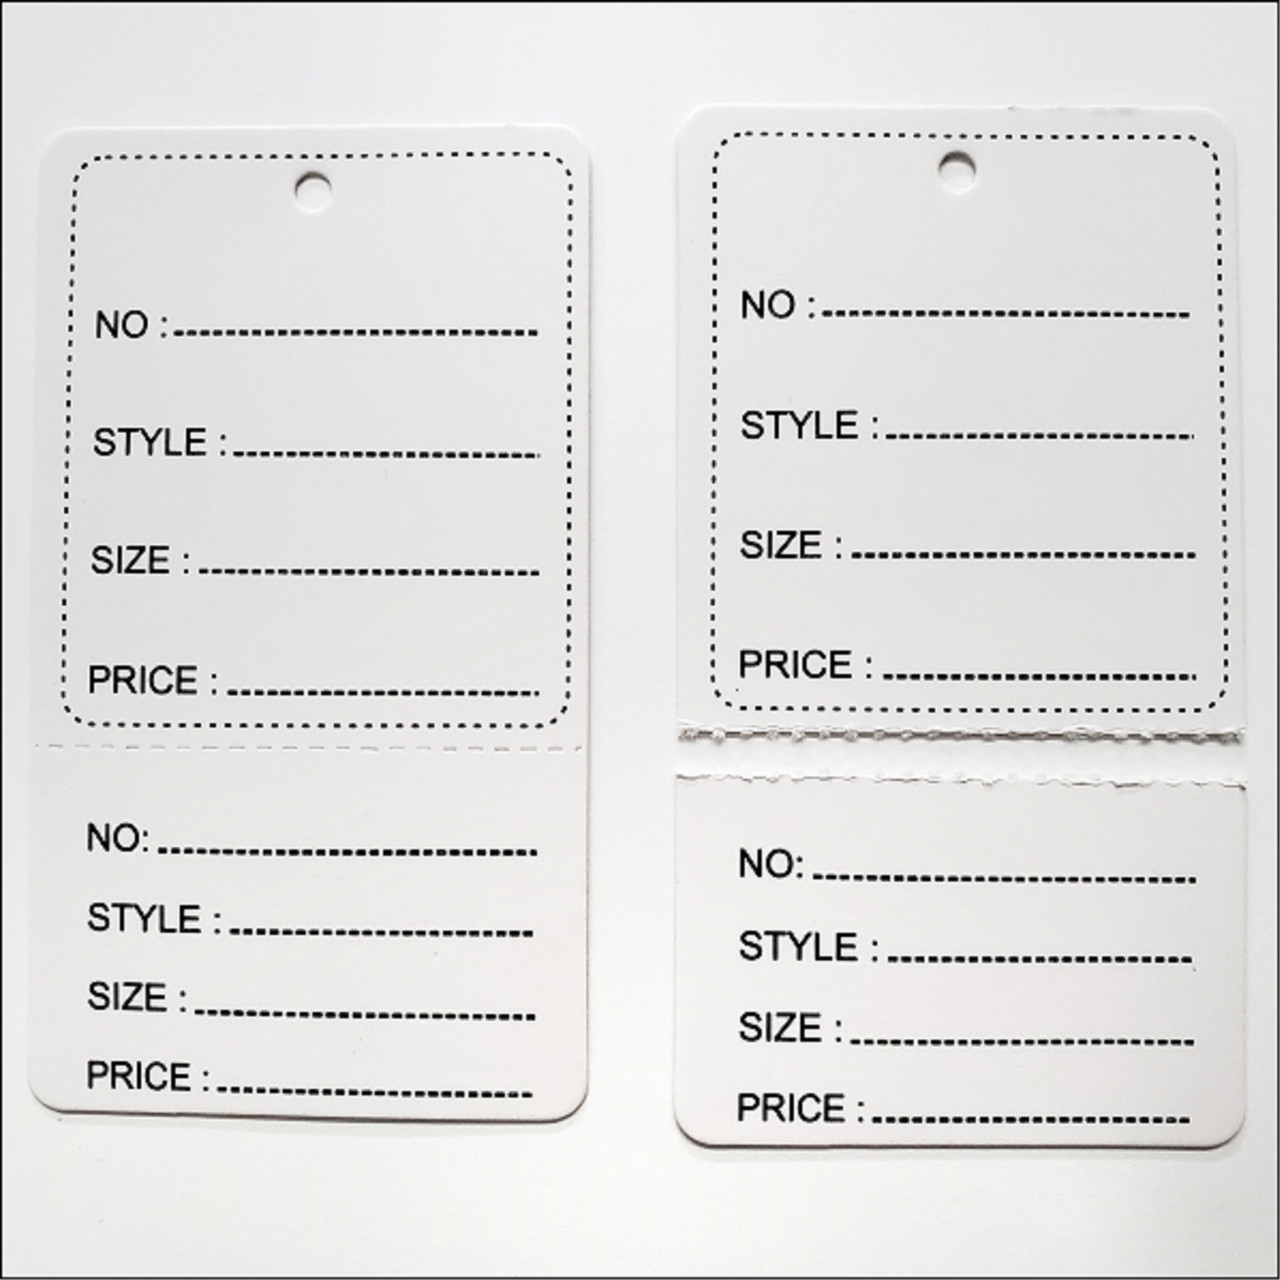 2 Part Printed Paper tag labels